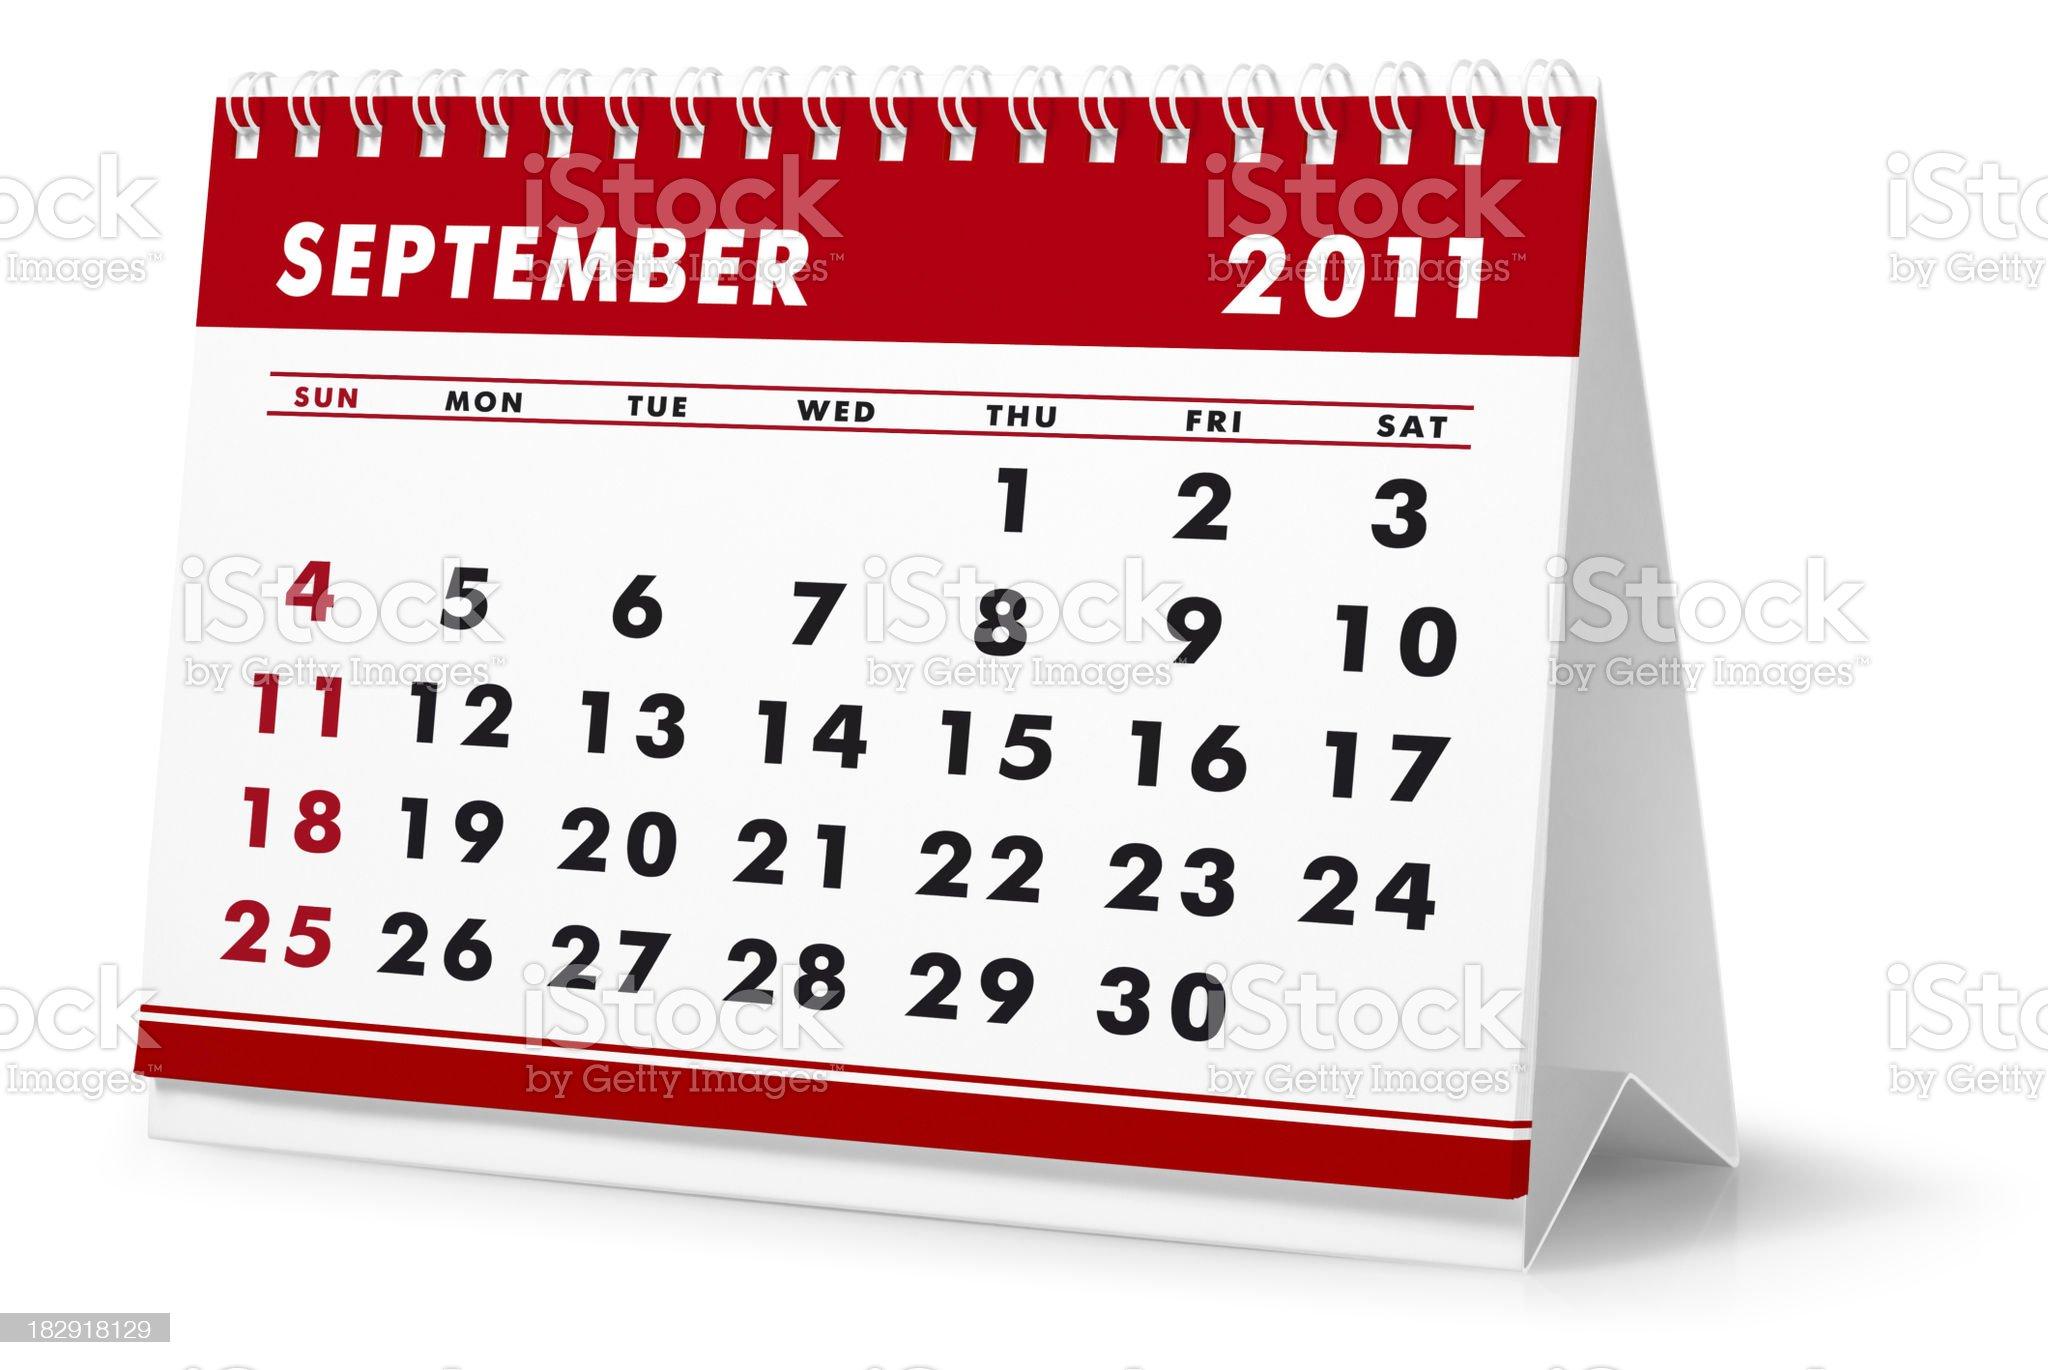 Year 2011, month September - desktop calendar royalty-free stock photo